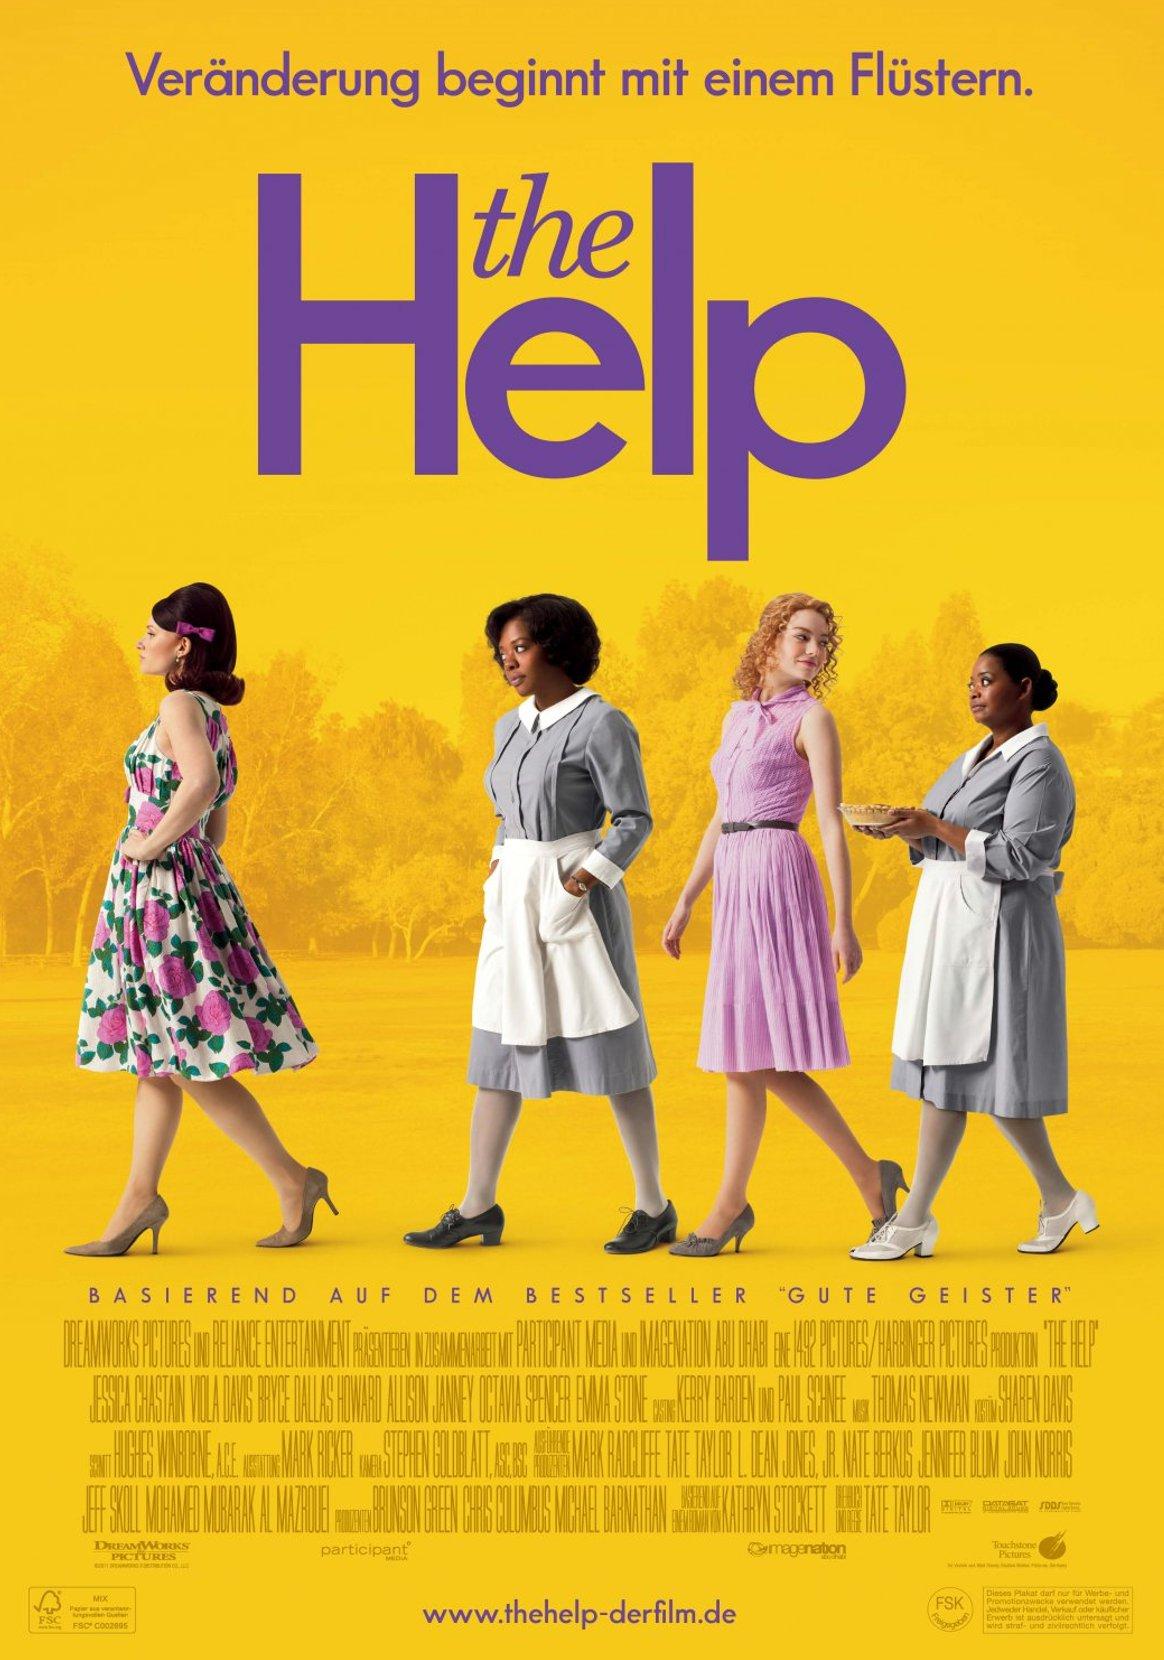 THE HELP Movie Images Emma Stone Viola Davis   Collider KI Group